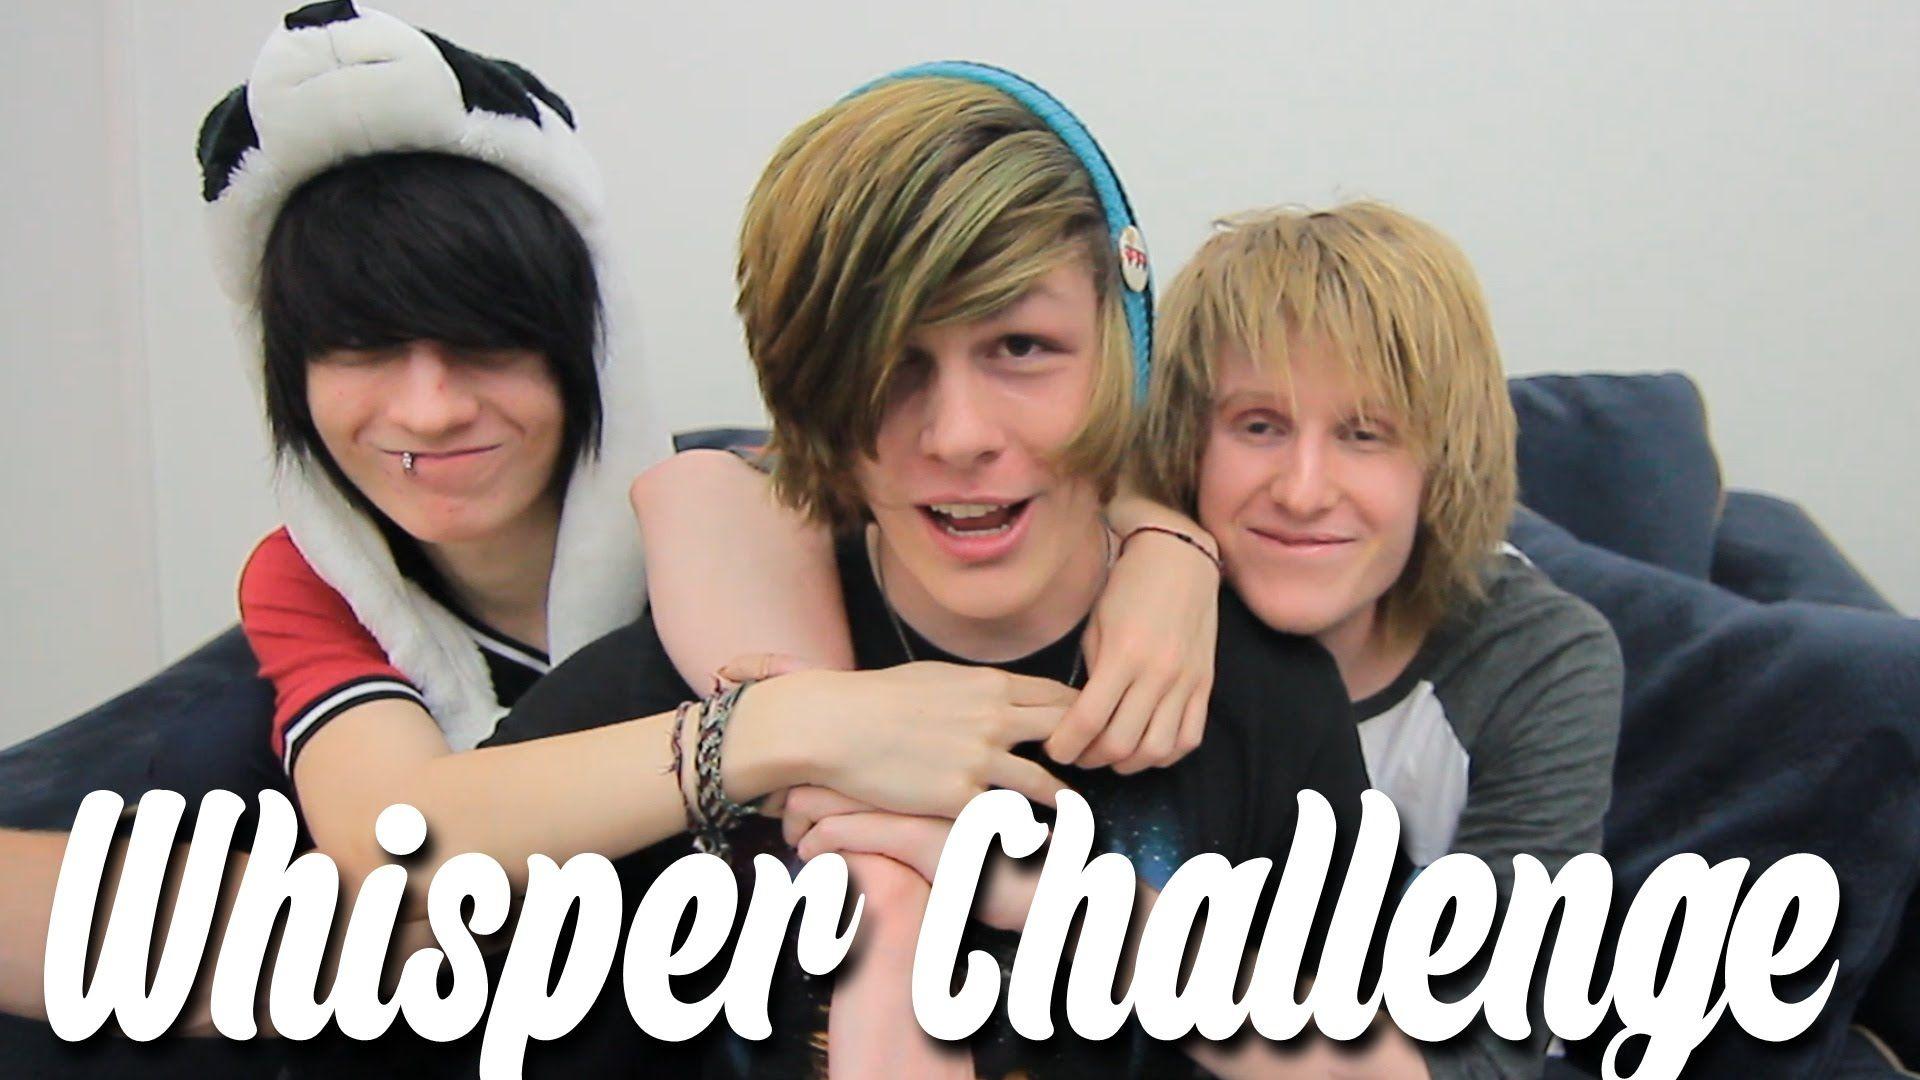 Whisper challenge ft johnnie and bryan emo guys pinterest